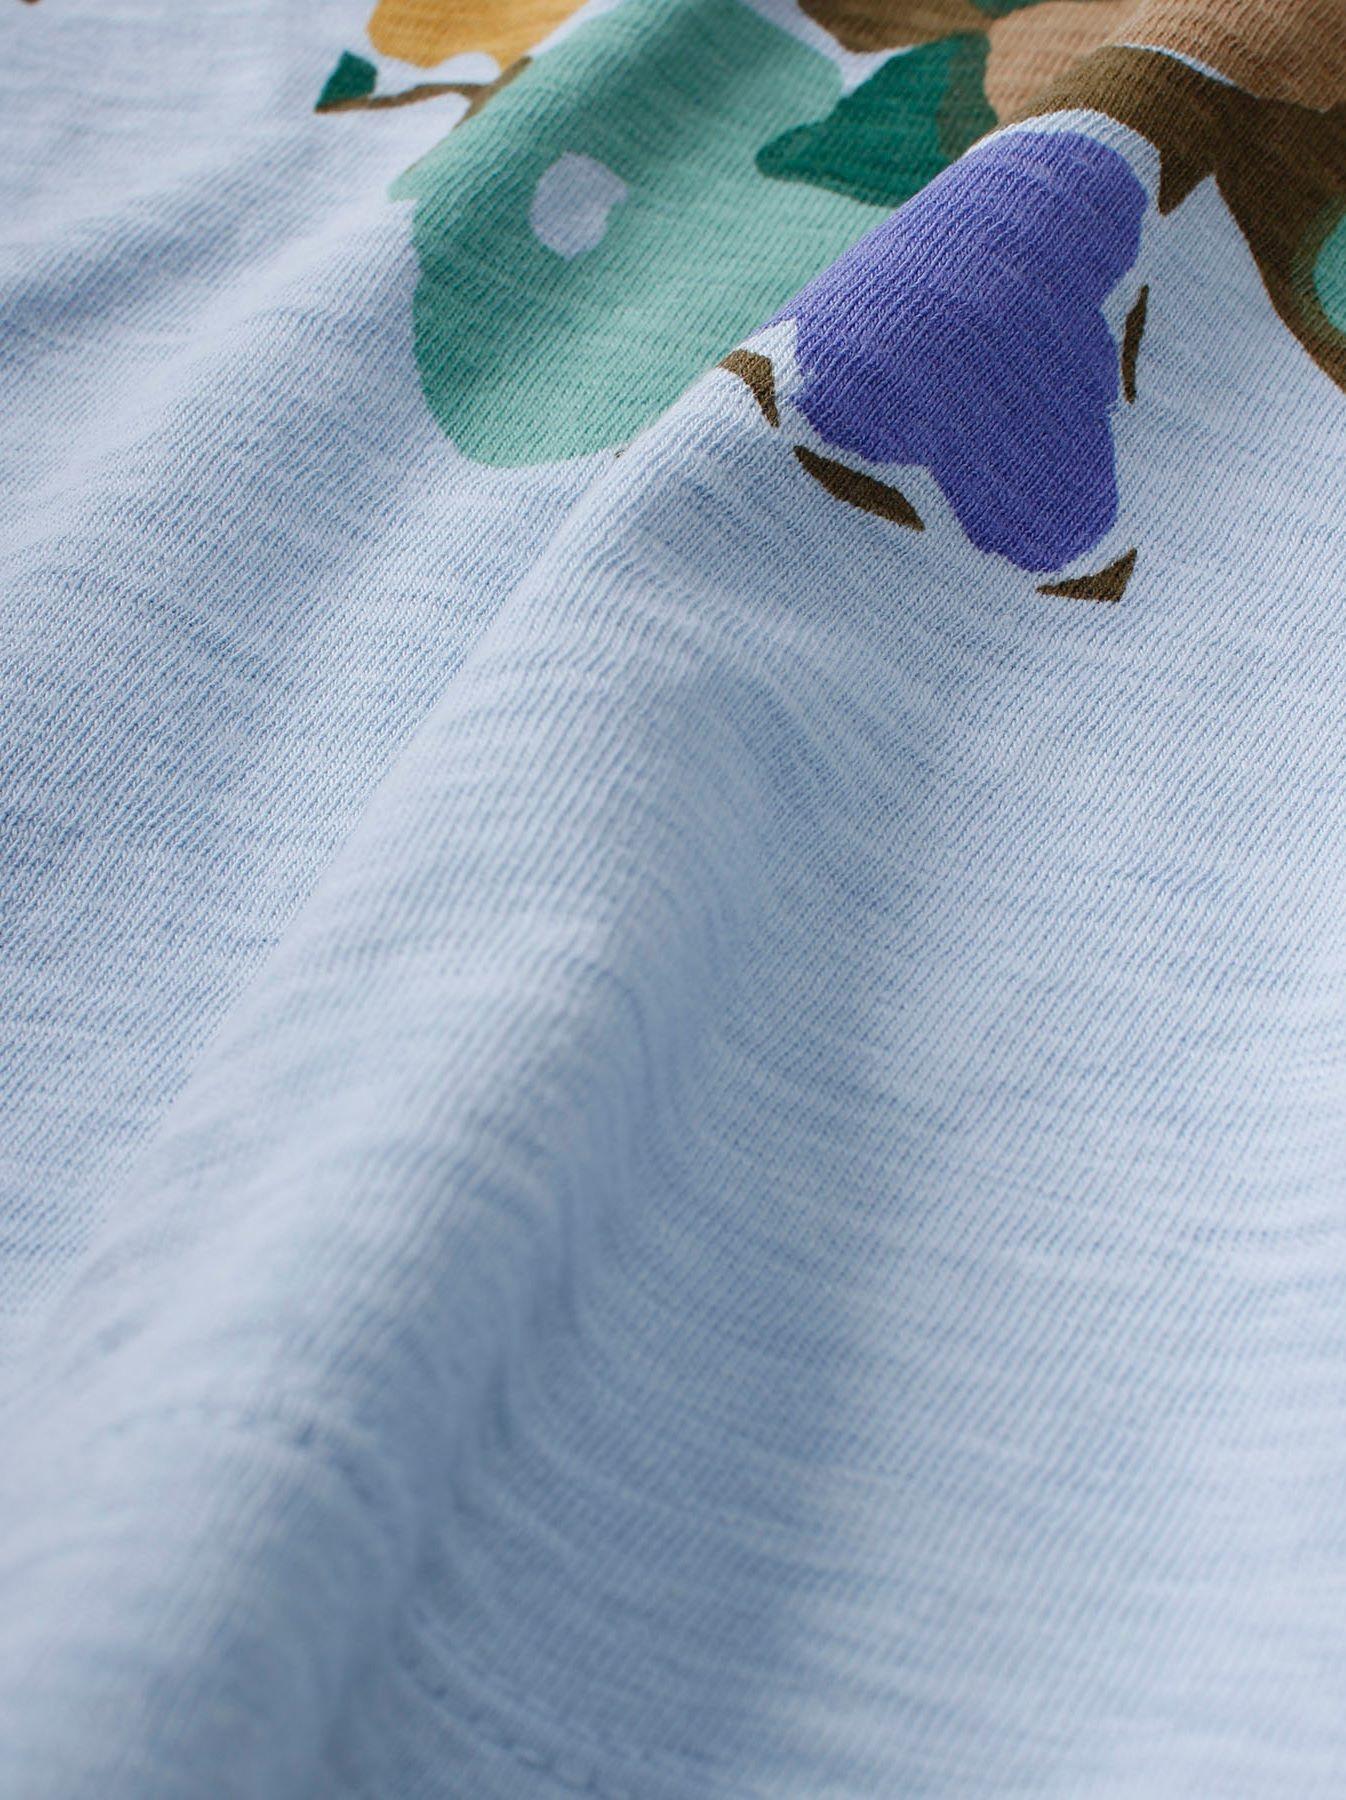 WH 45 Star T-shirt (Flower)-9